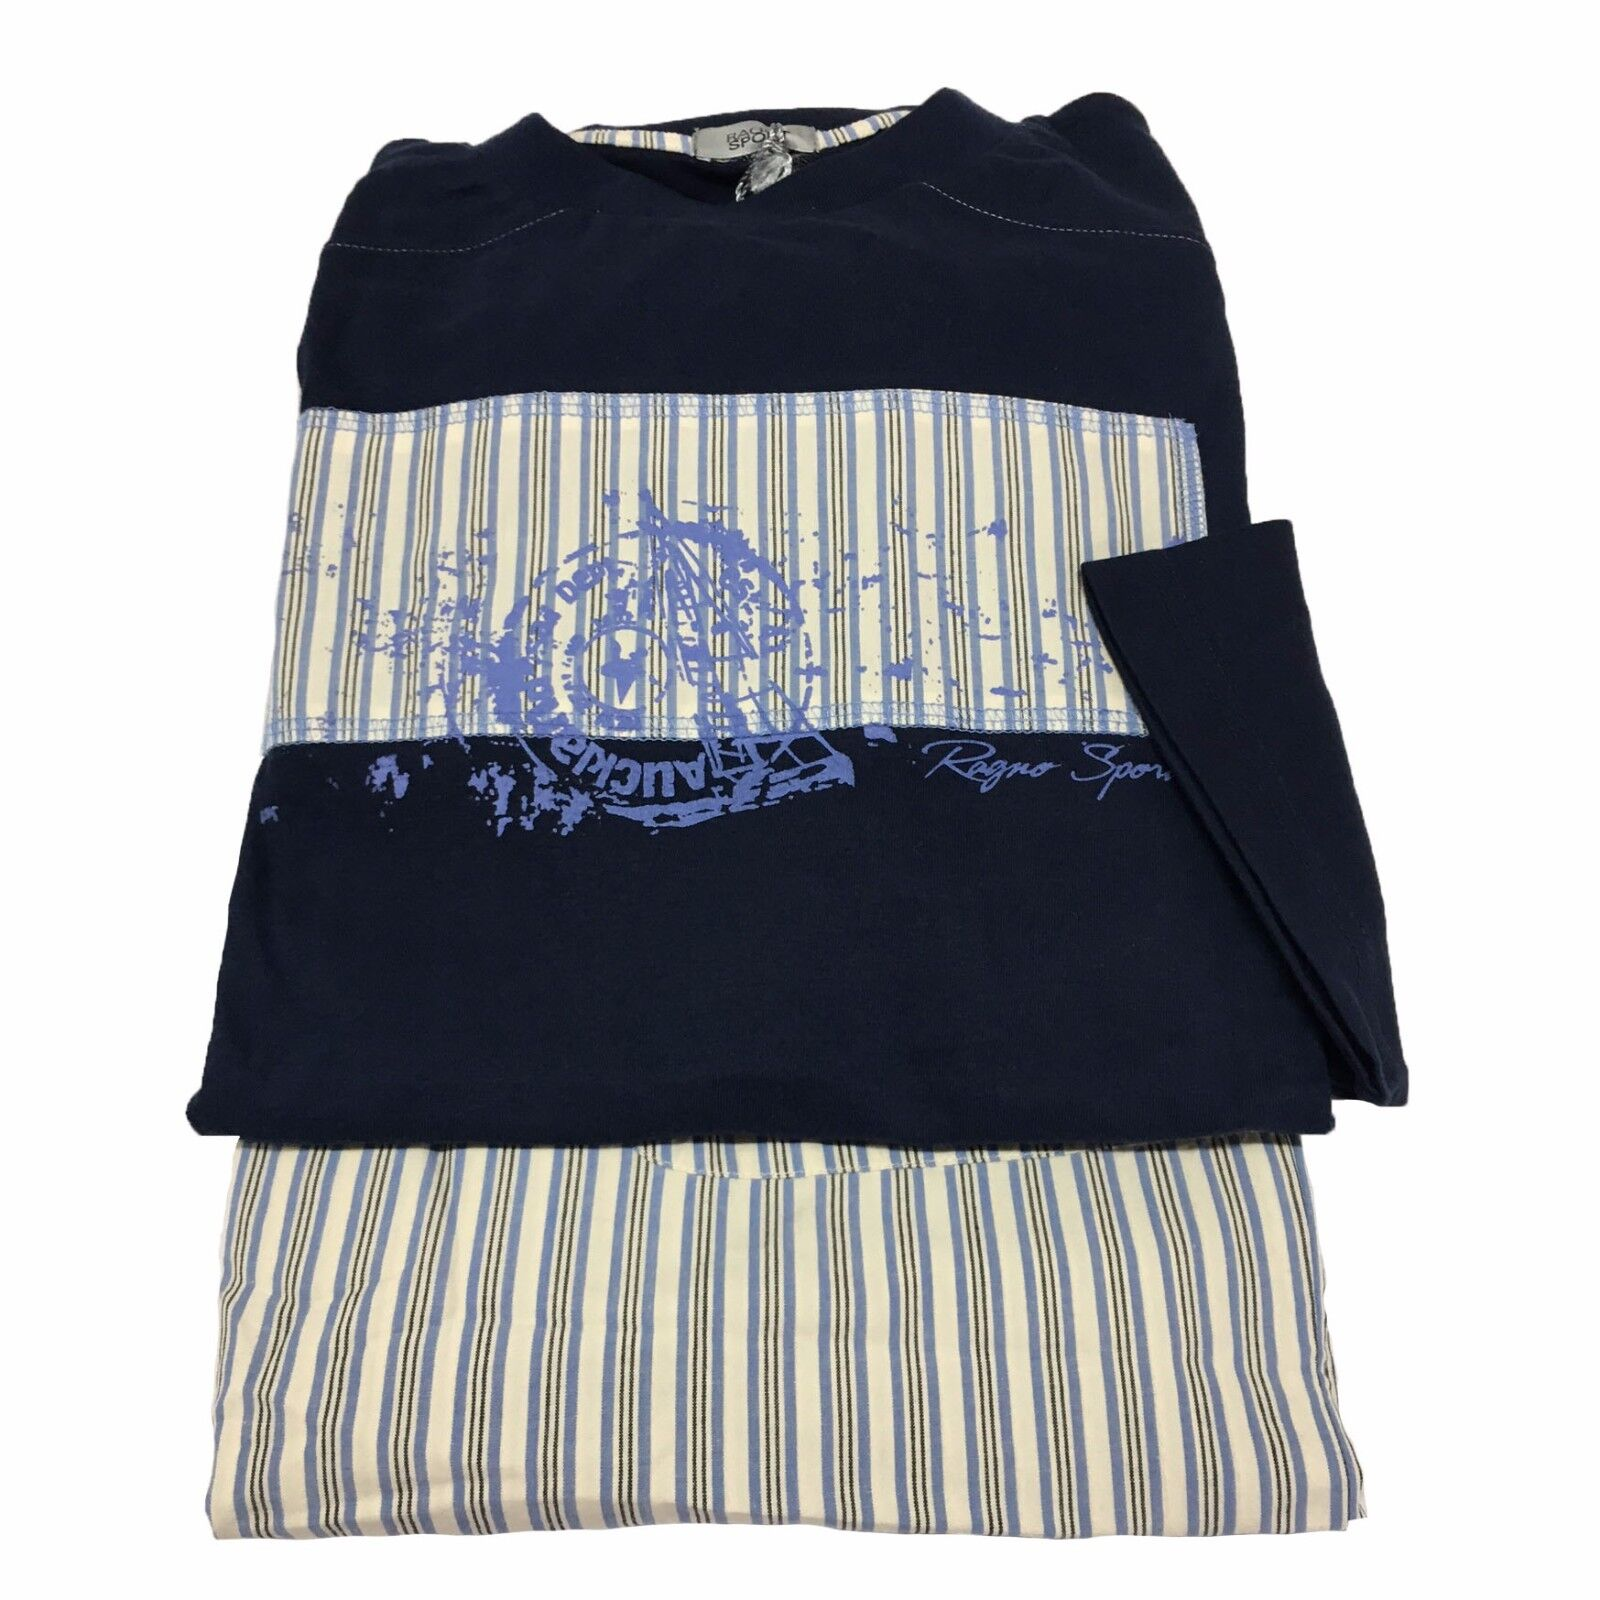 RAGNO SPORT man pajamas long sleeve bluee striped 100% cotton